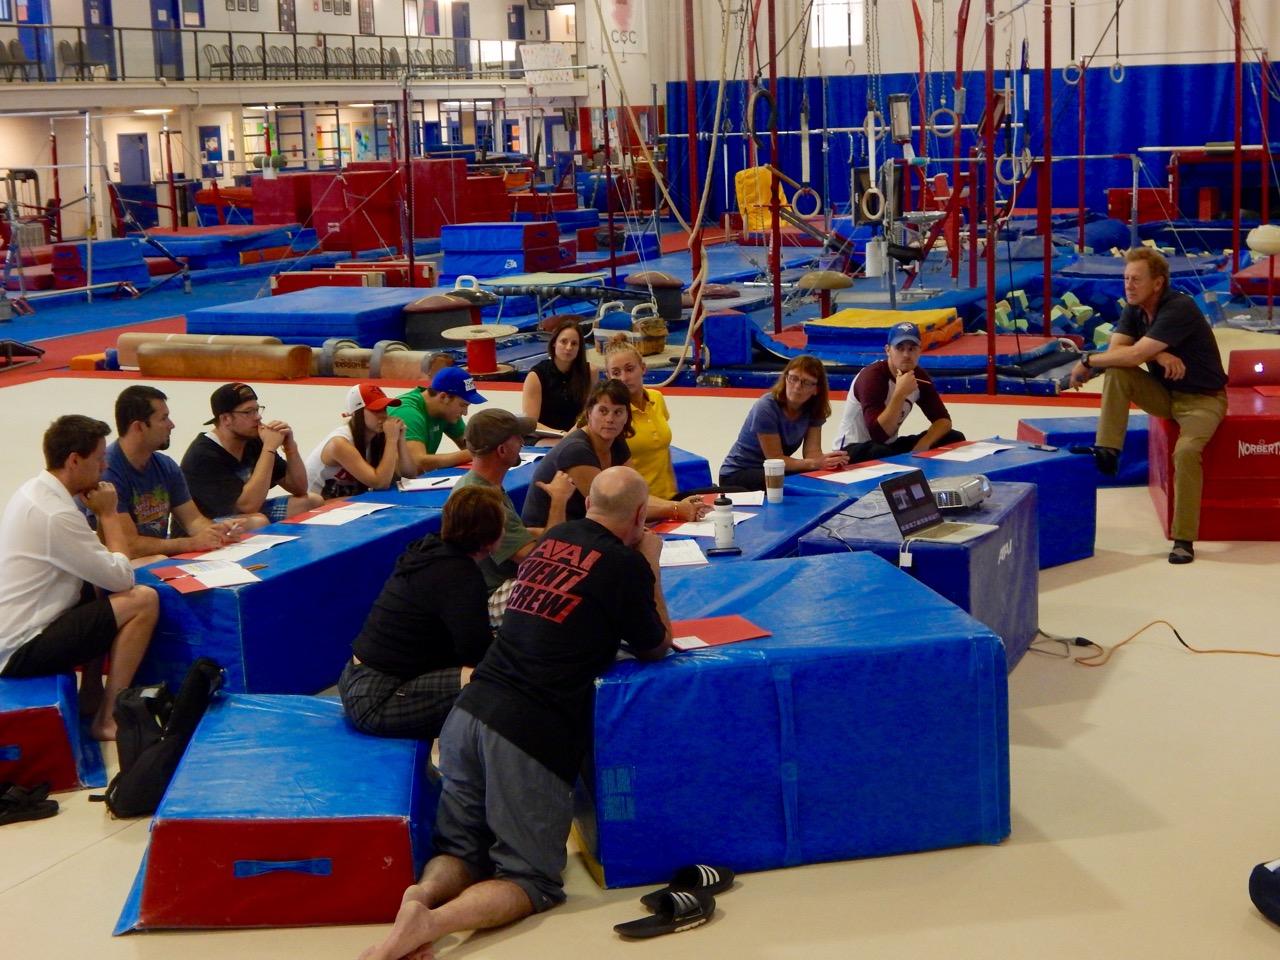 Gymnastics Training Bar Rhode Island Stores